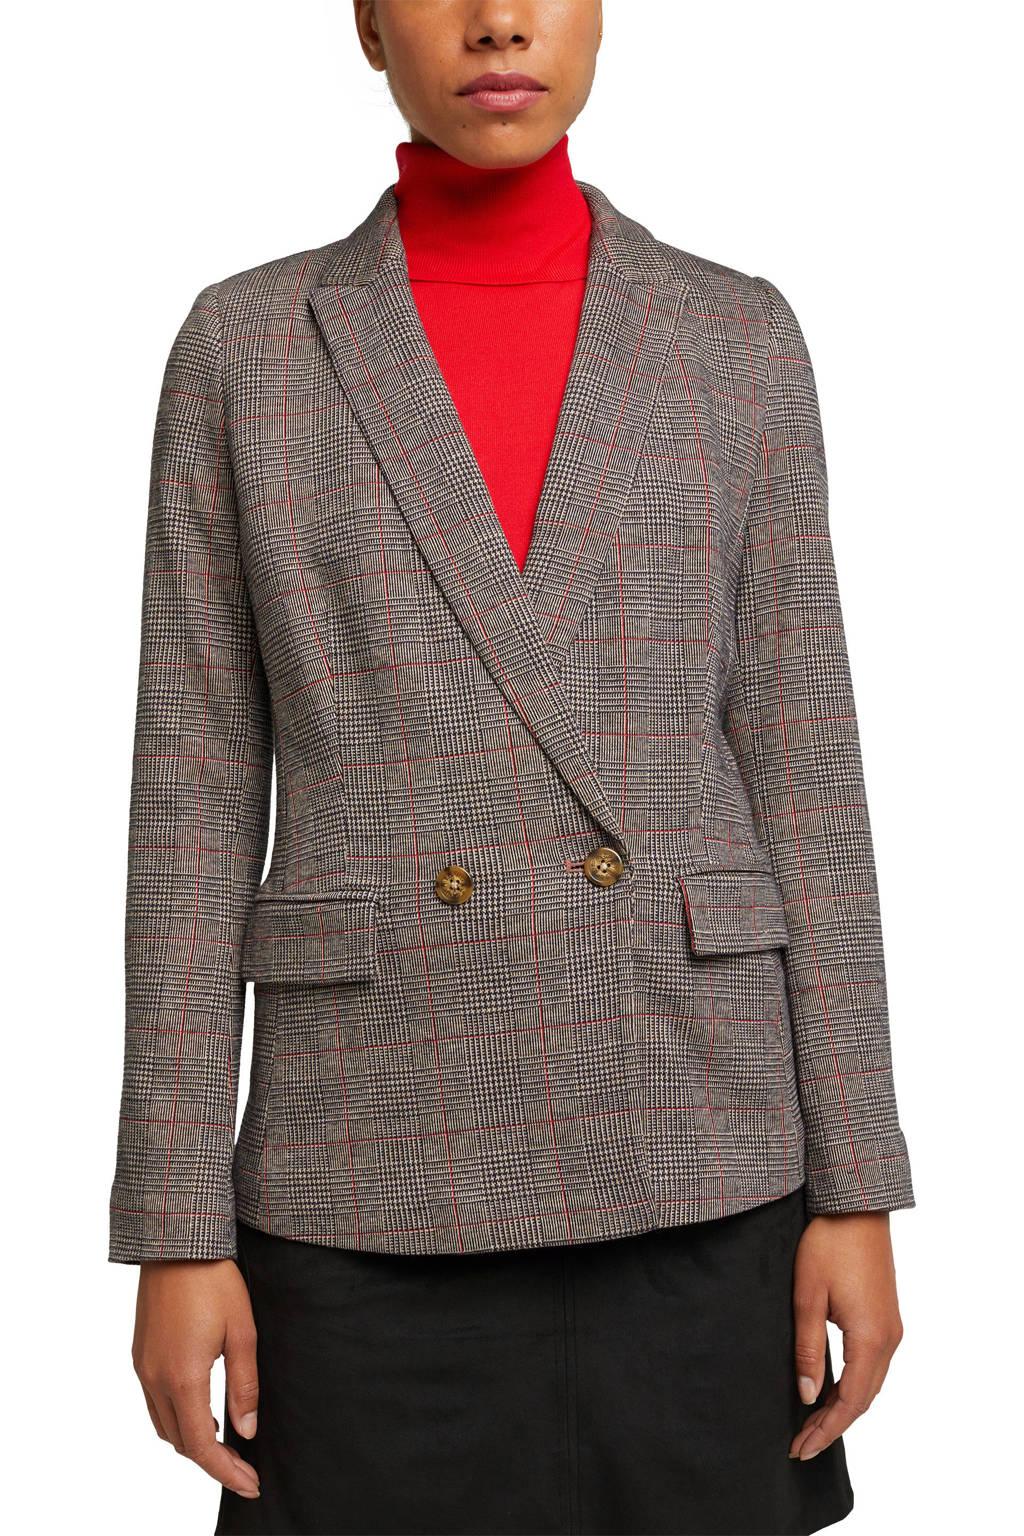 ESPRIT Women Casual geruite blazer bruin/zwart/rood, Bruin/Zwart/Rood